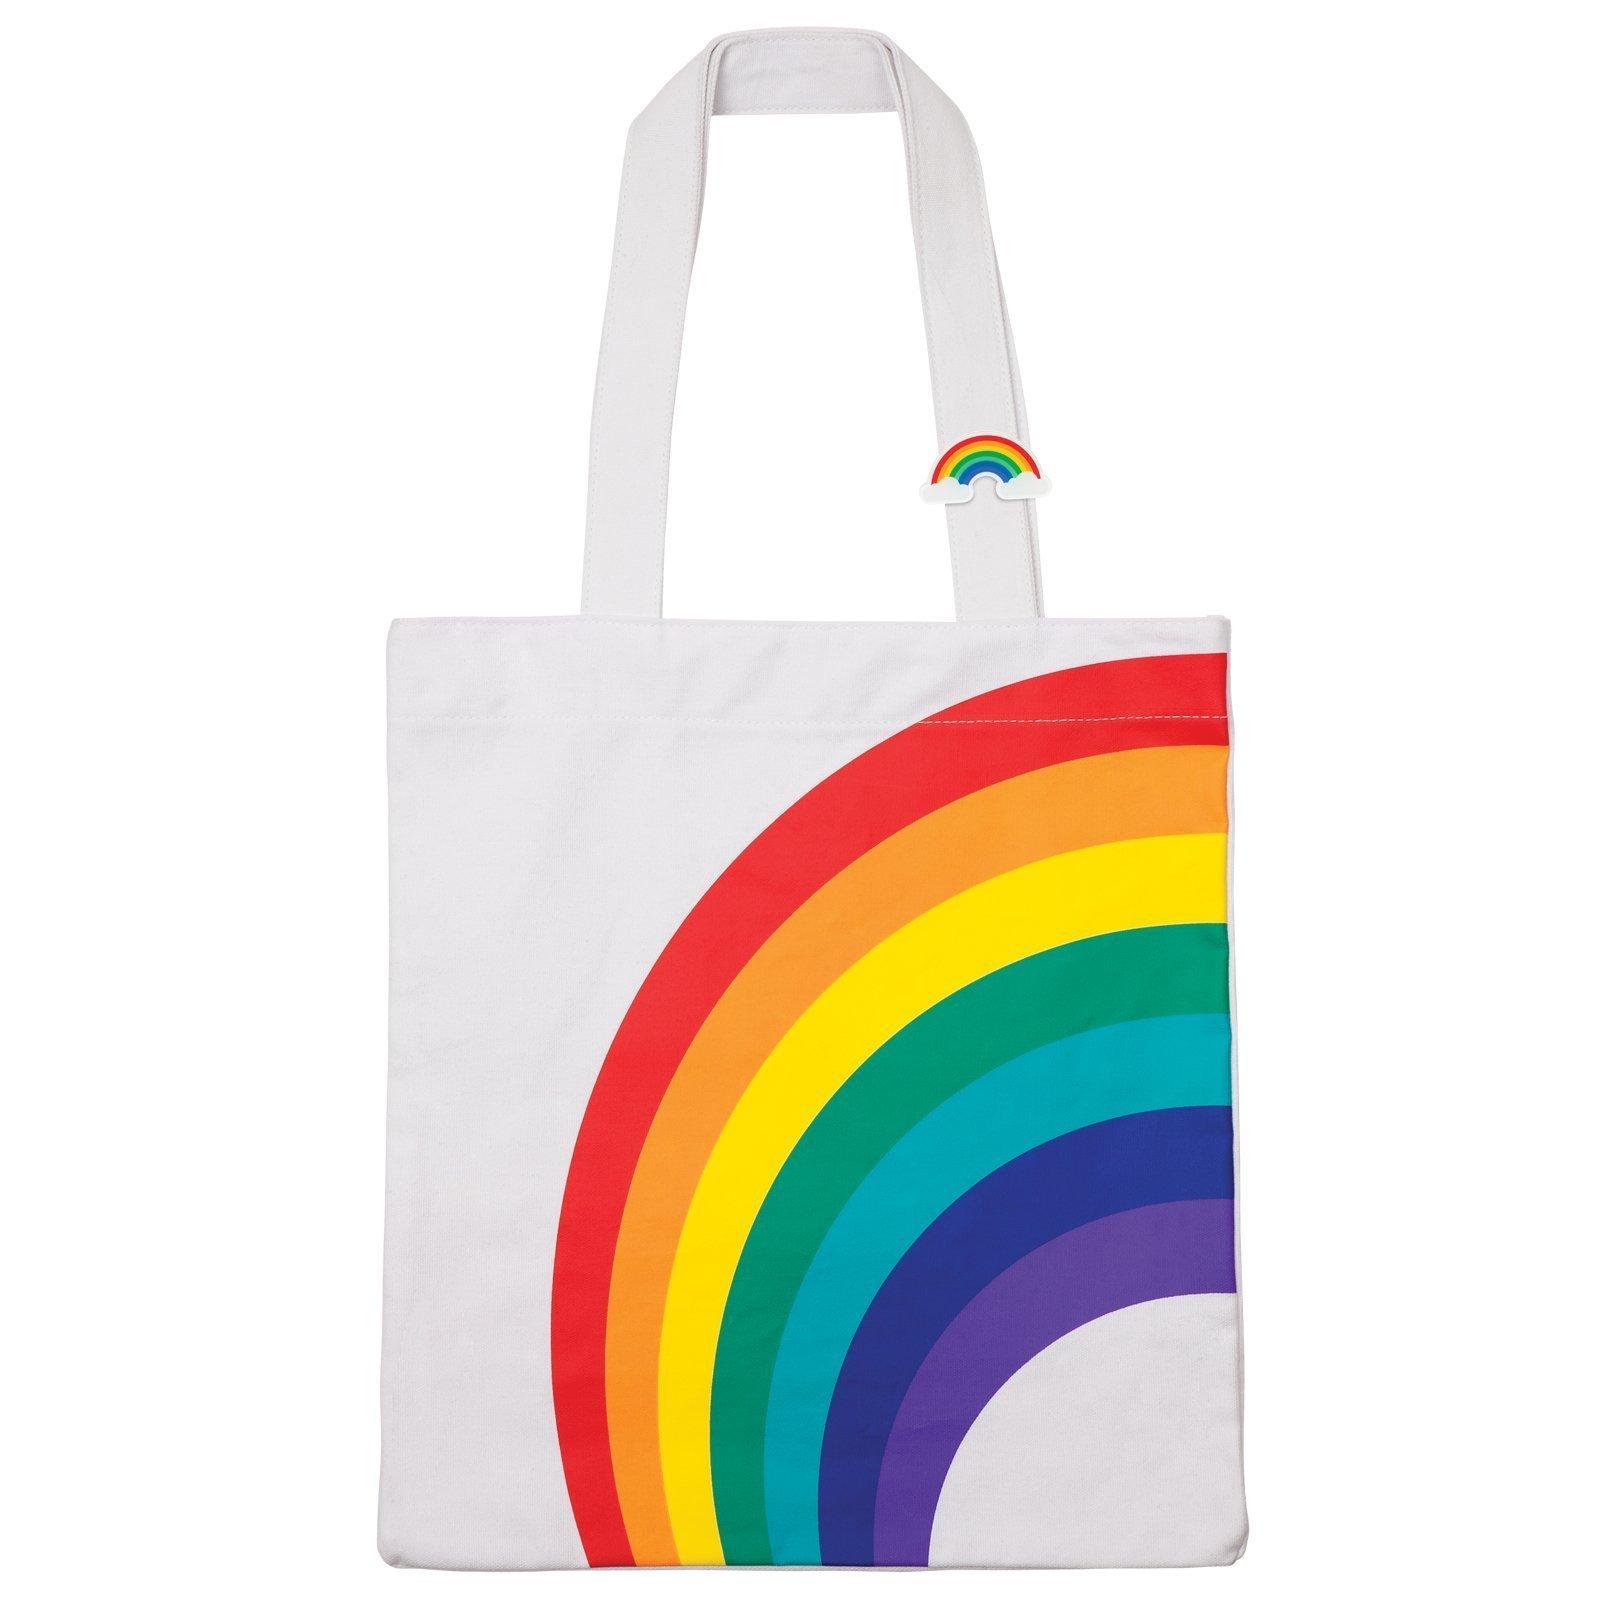 Borsa Stile Tot Bang Da Spiaggia Con Fanatsia Arcobaleno Cool Rainbow